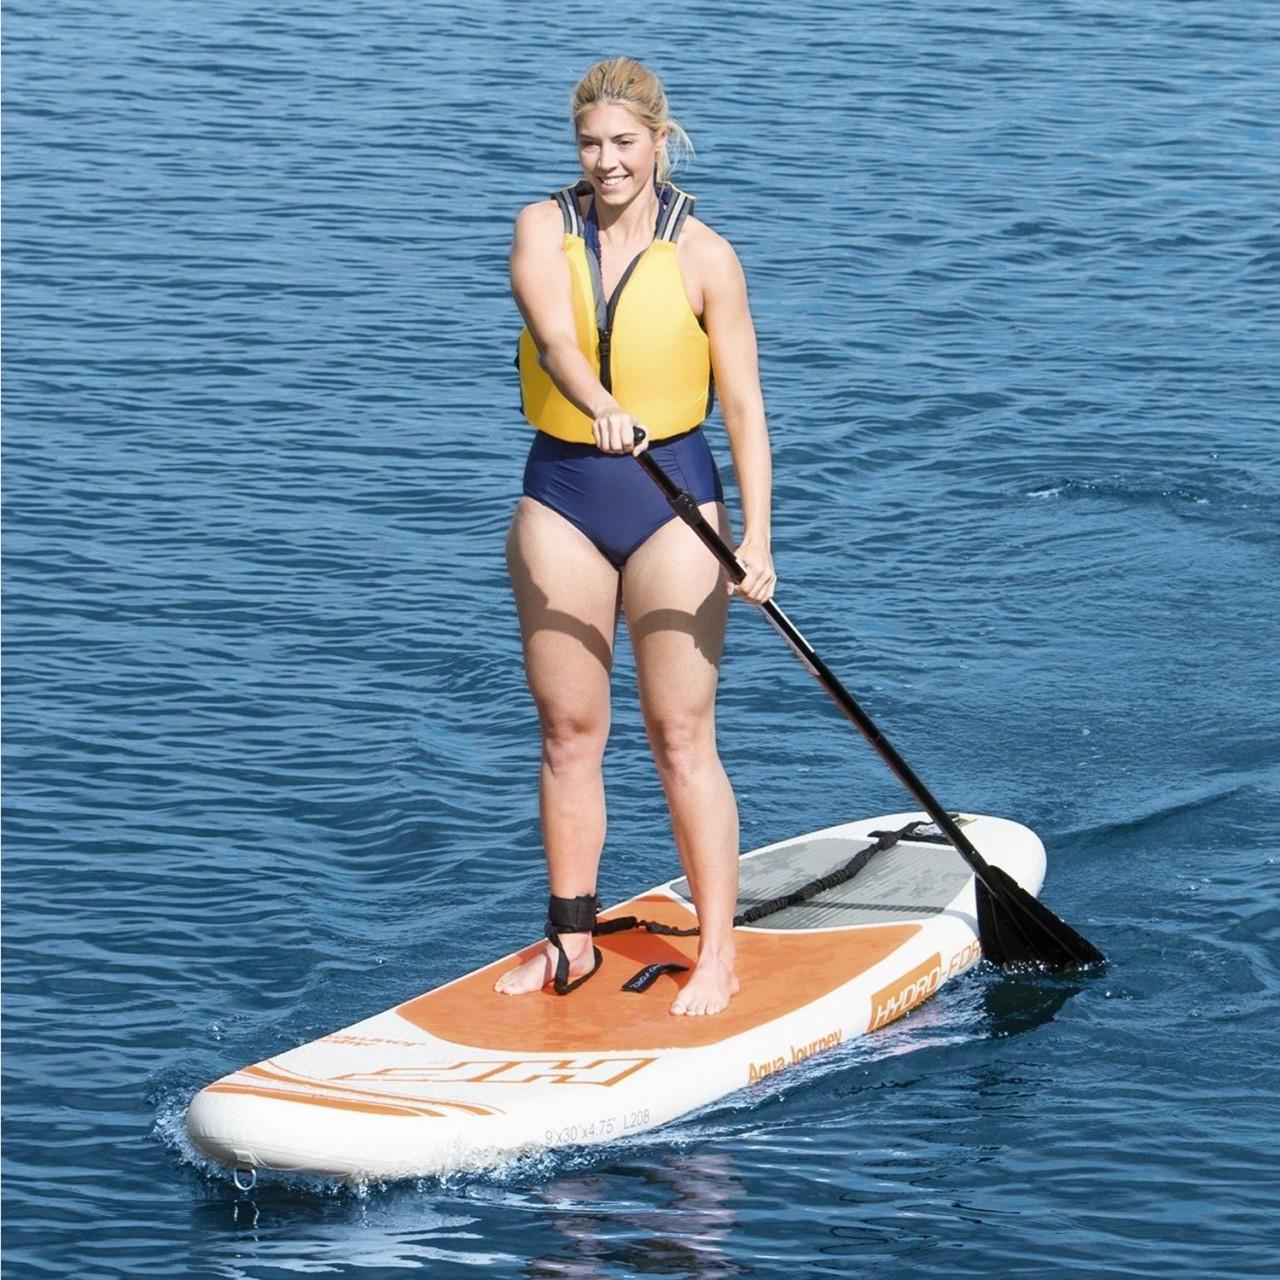 Bestway Hydro-Force Fiberglass Paddle 217cm SUP-/iSUP-Paddel aus Fiberglas 65307